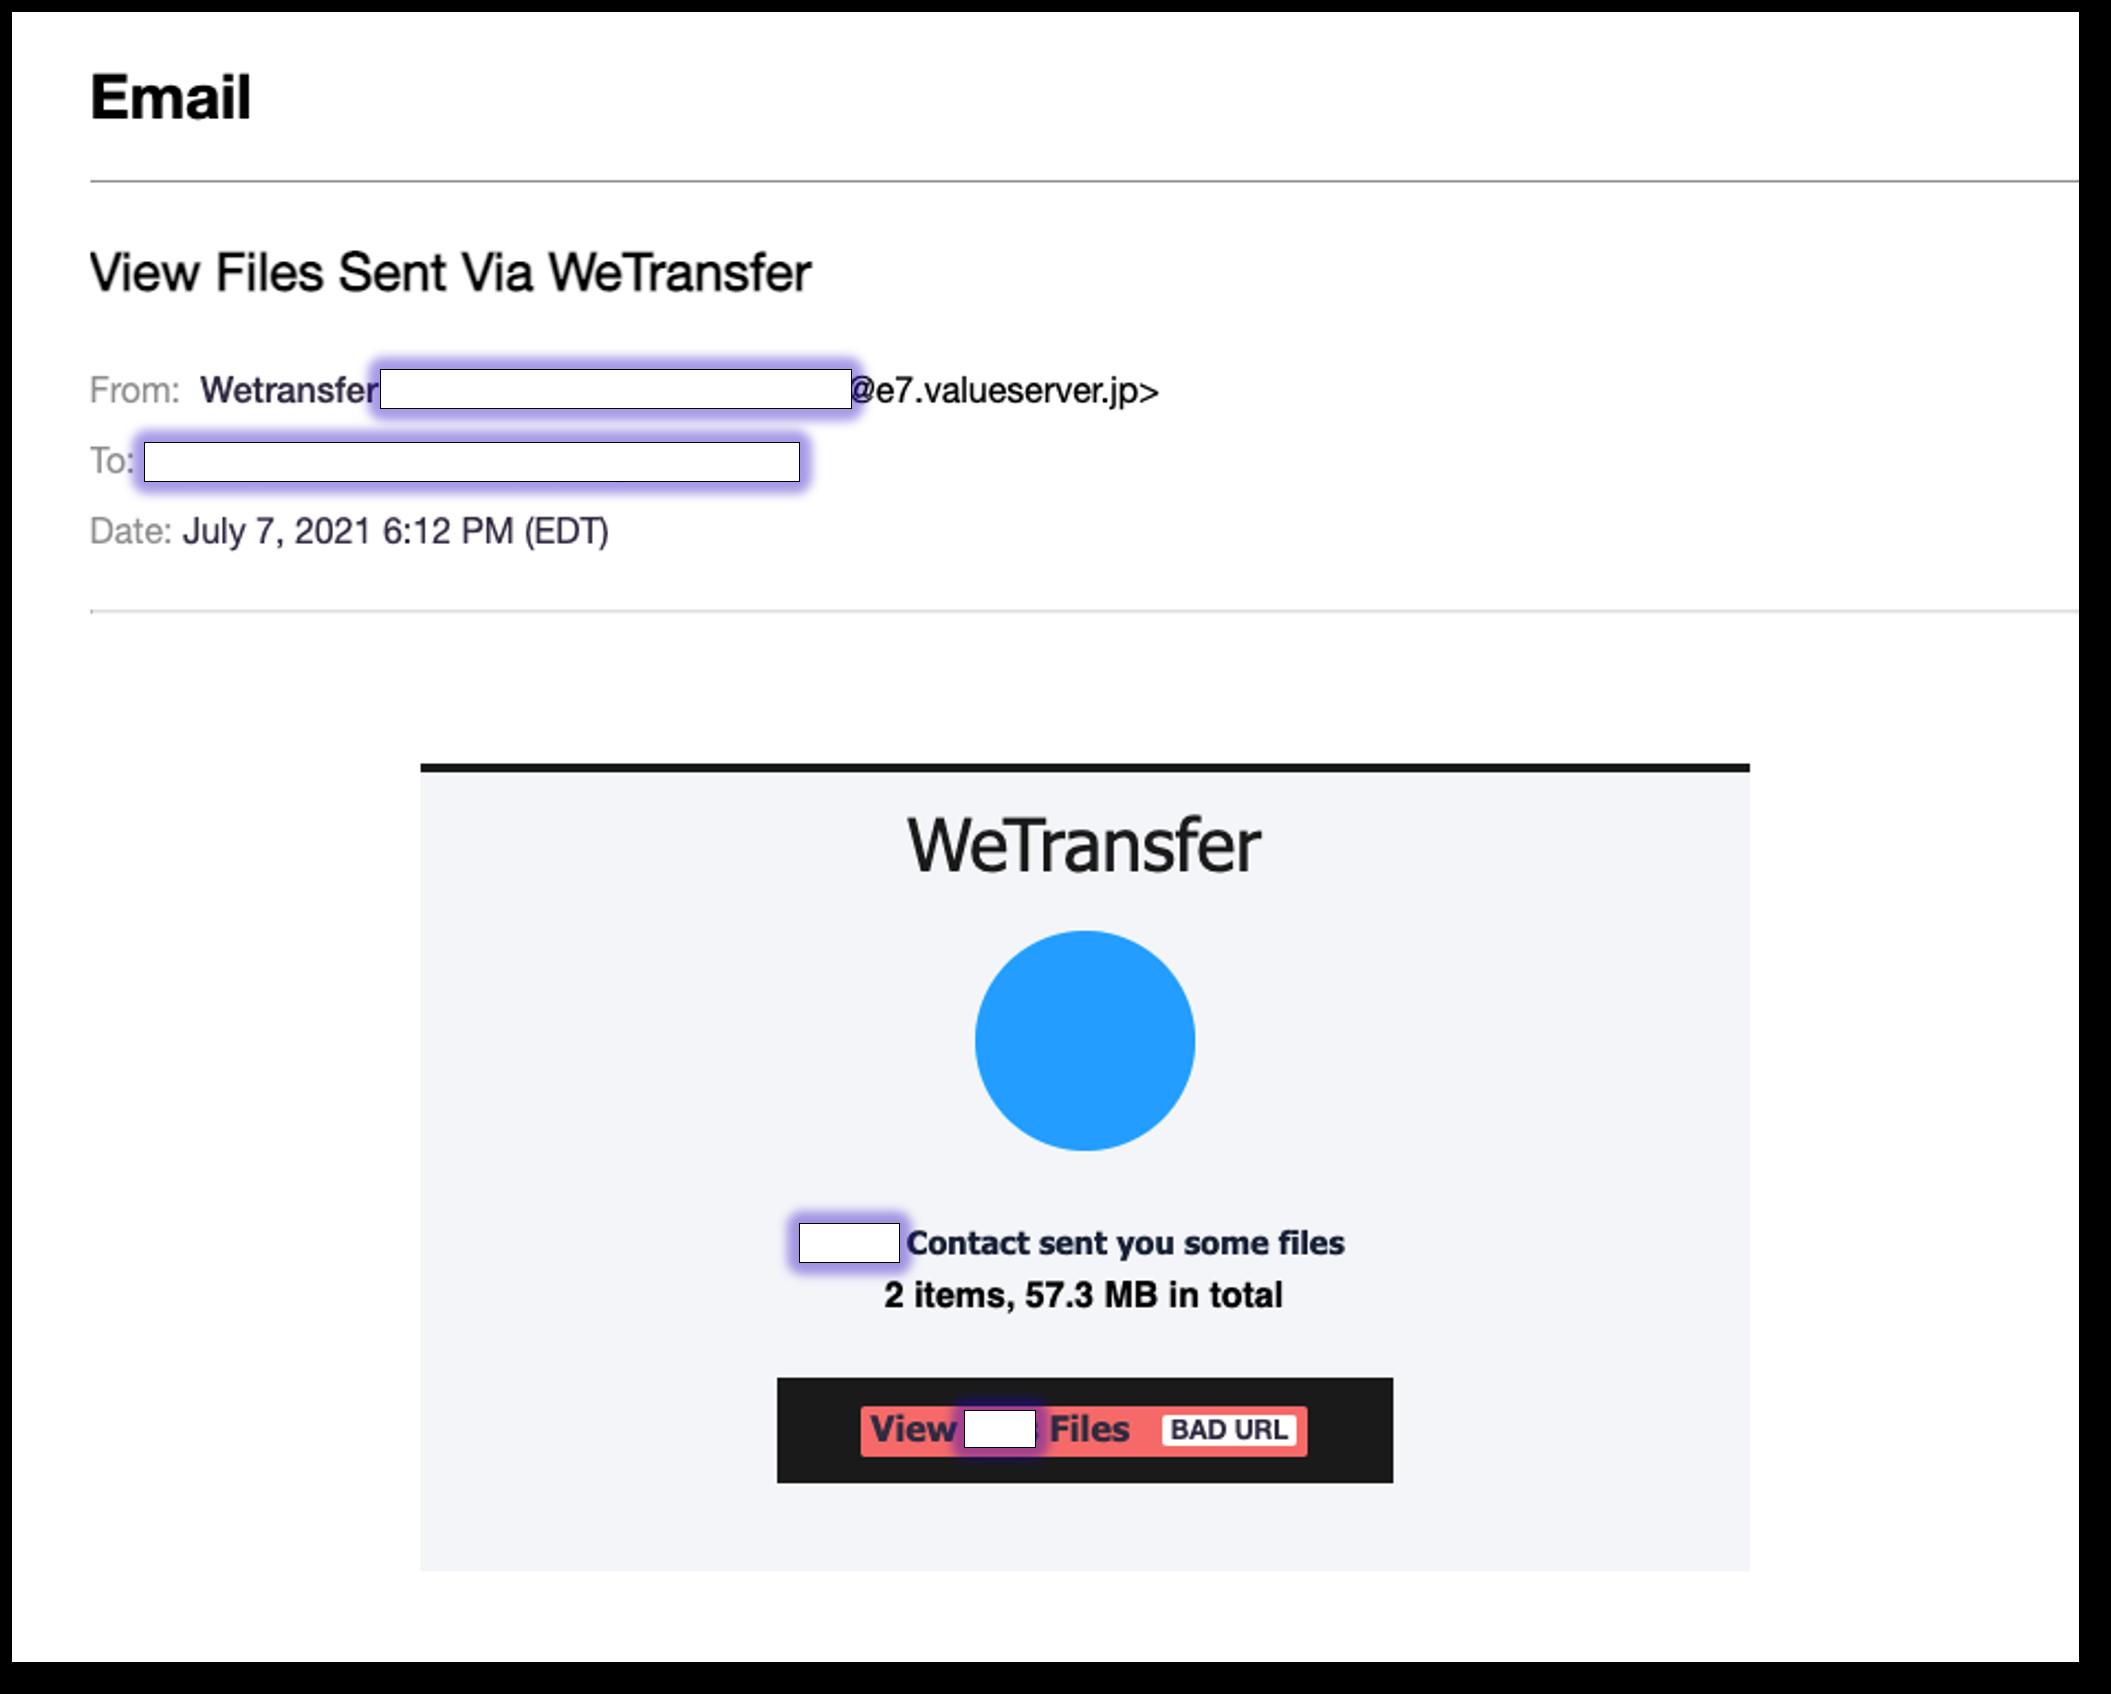 WeTransfer phishing email